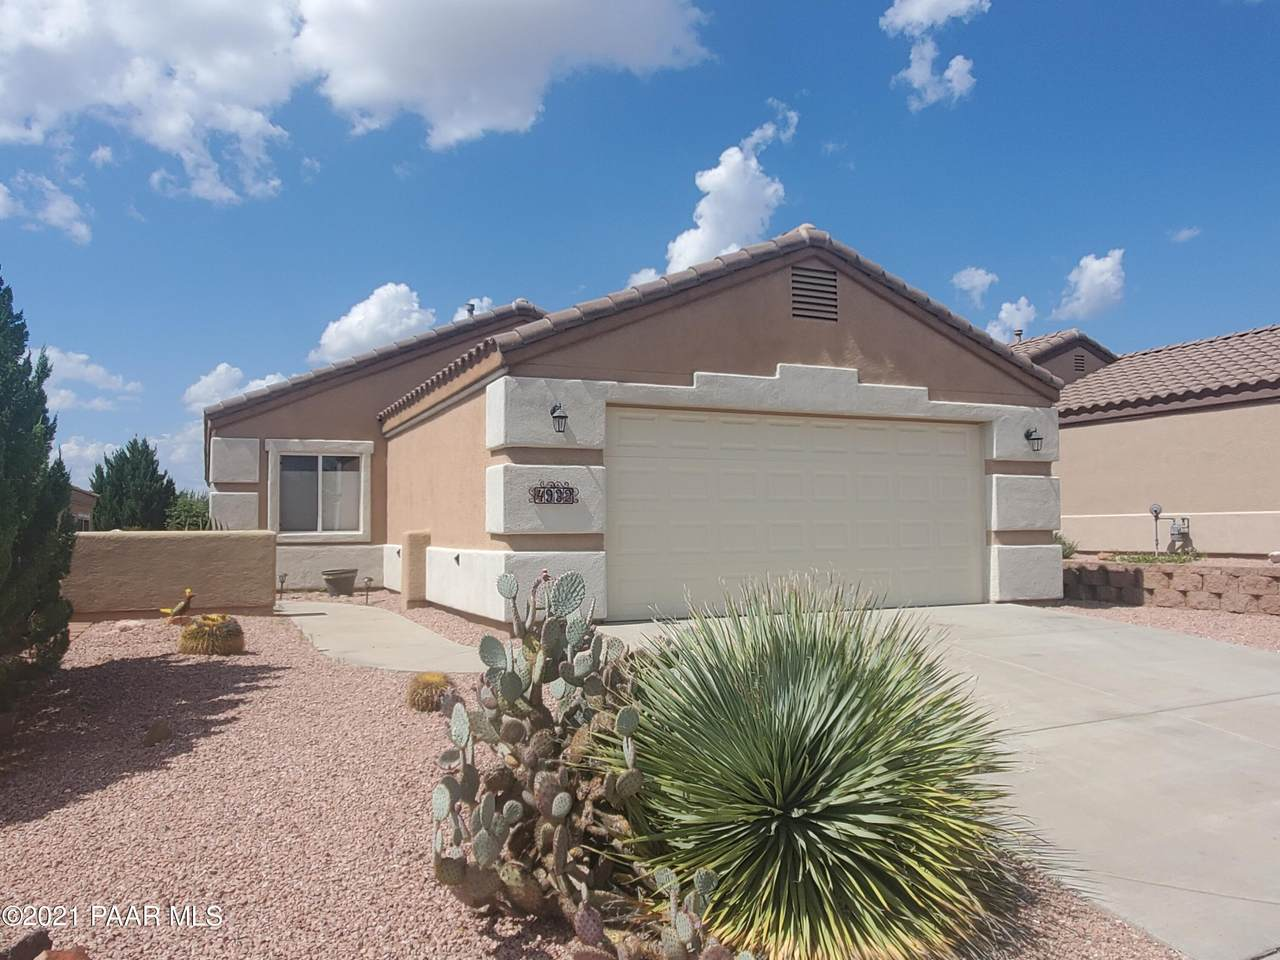 4932 Meadow Vista Drive - Photo 1